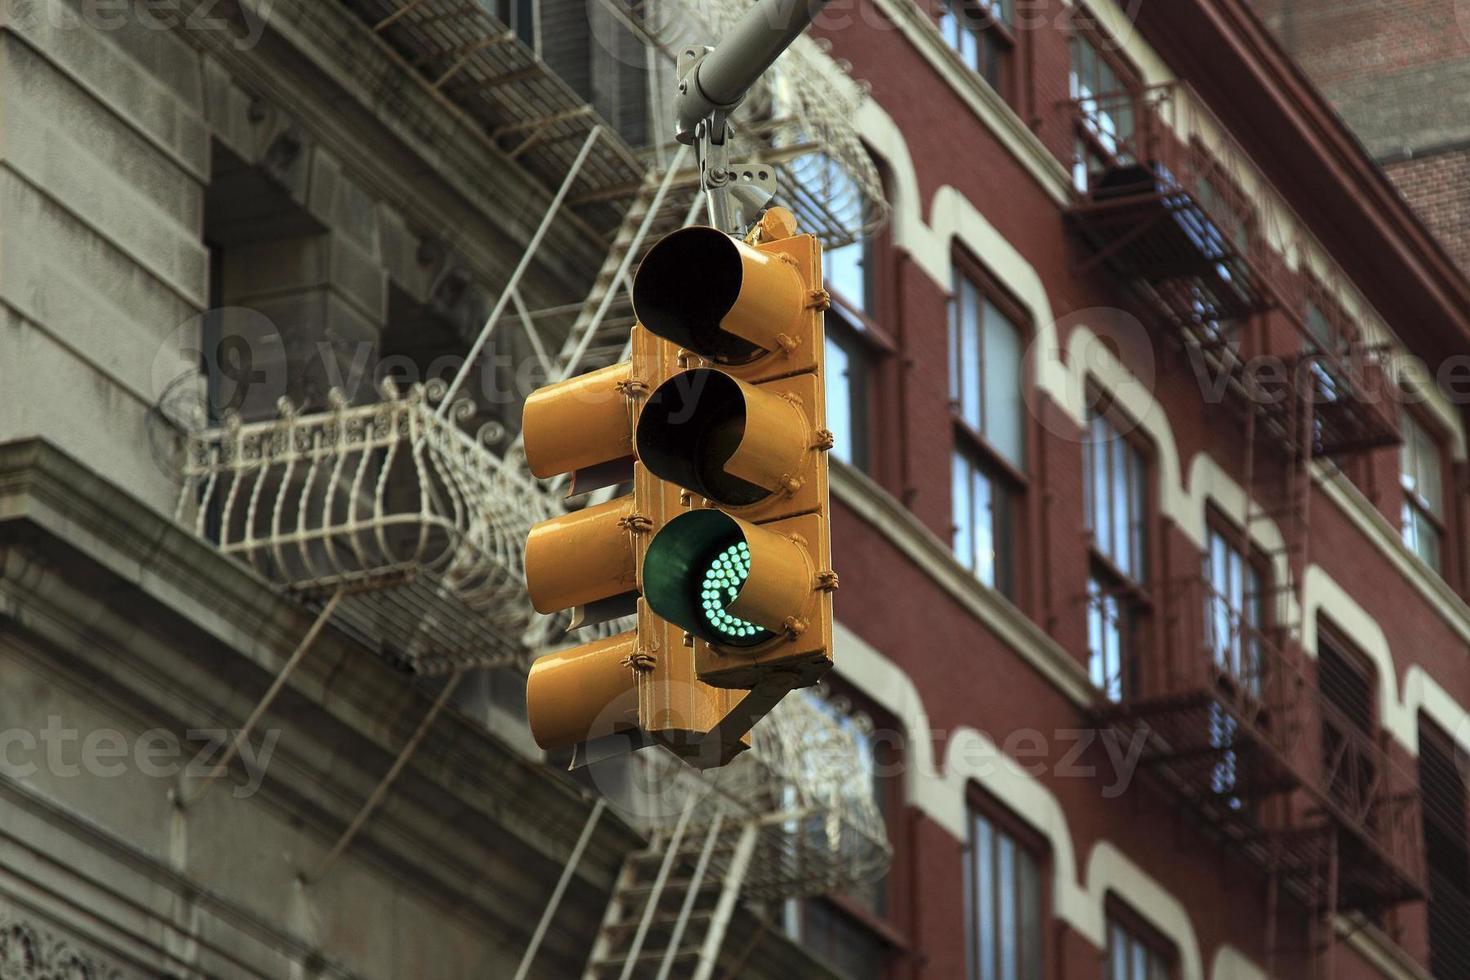 feu de circulation, new york city photo